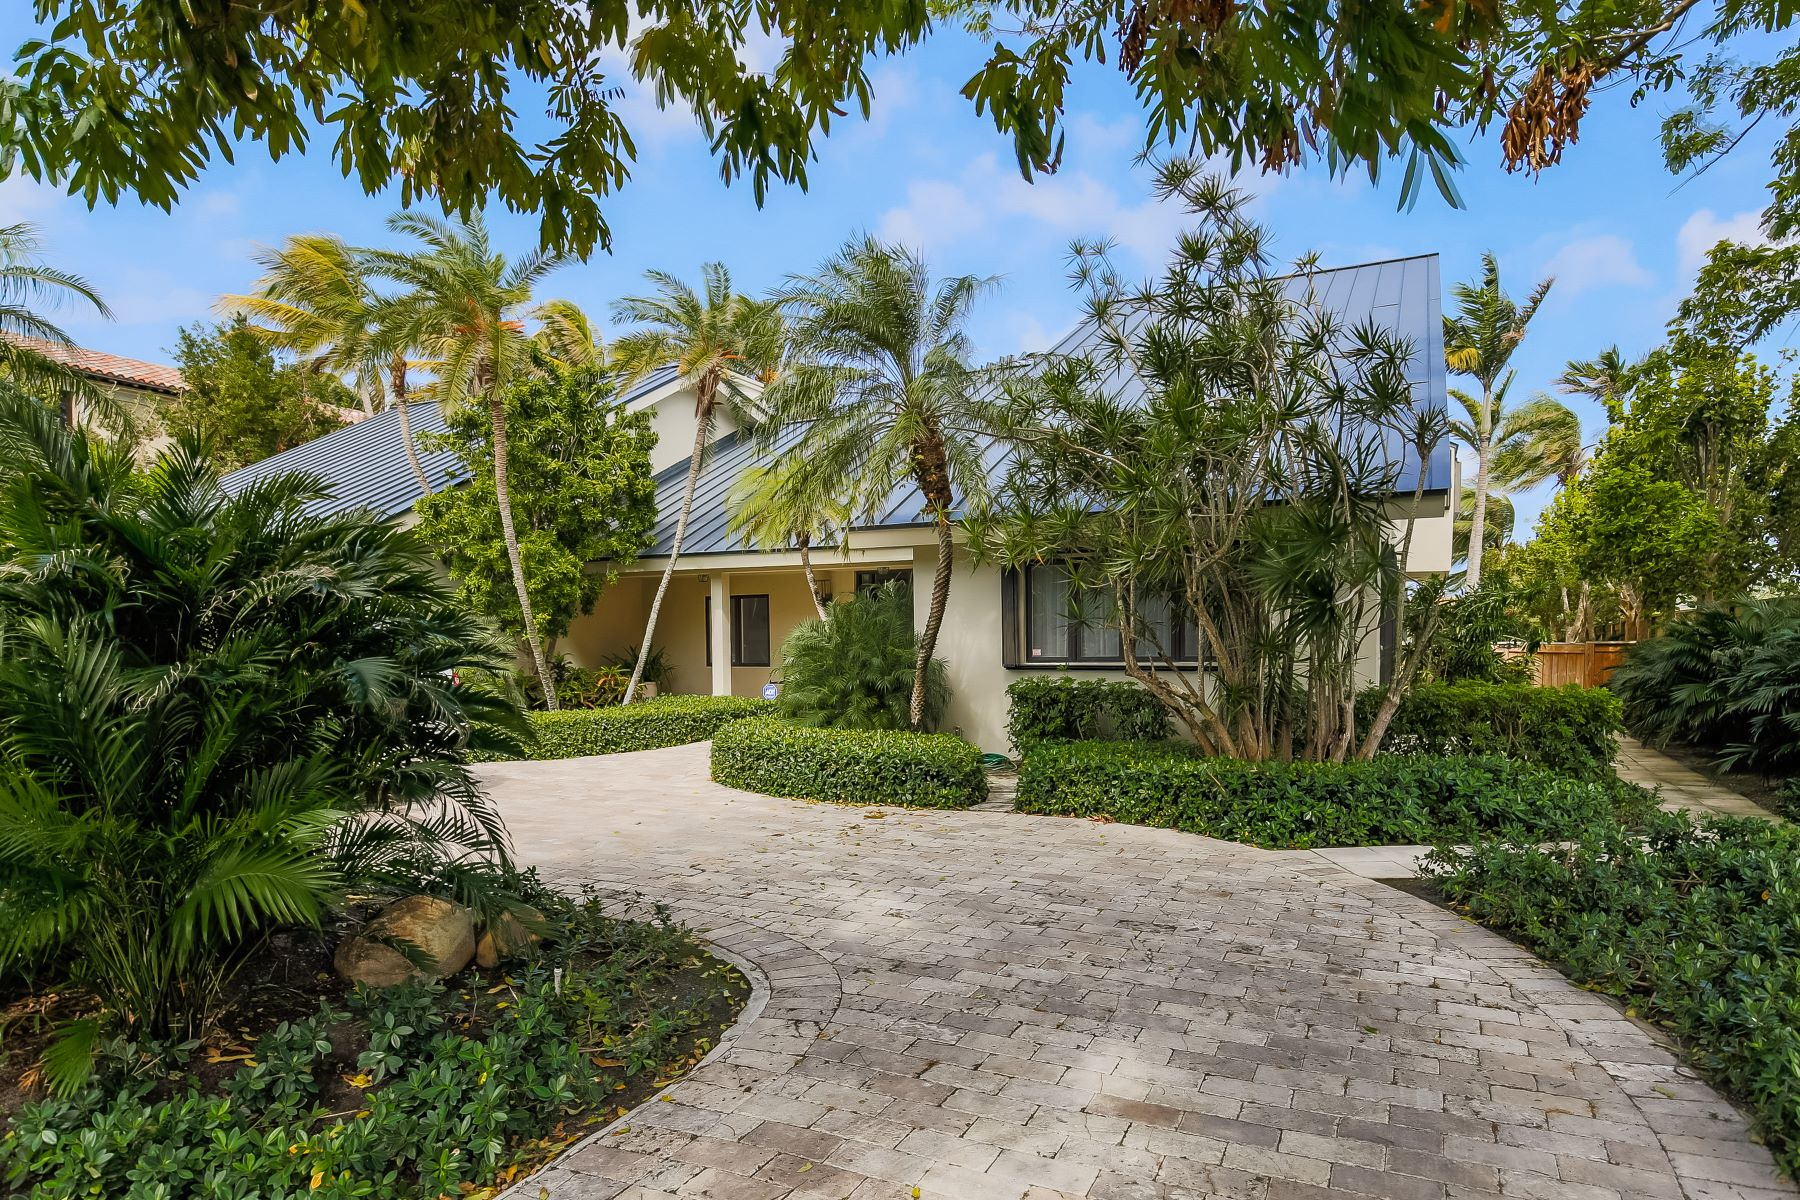 Single Family Home for Sale at 735 N Mashta Dr Key Biscayne, Florida, 33149 United States